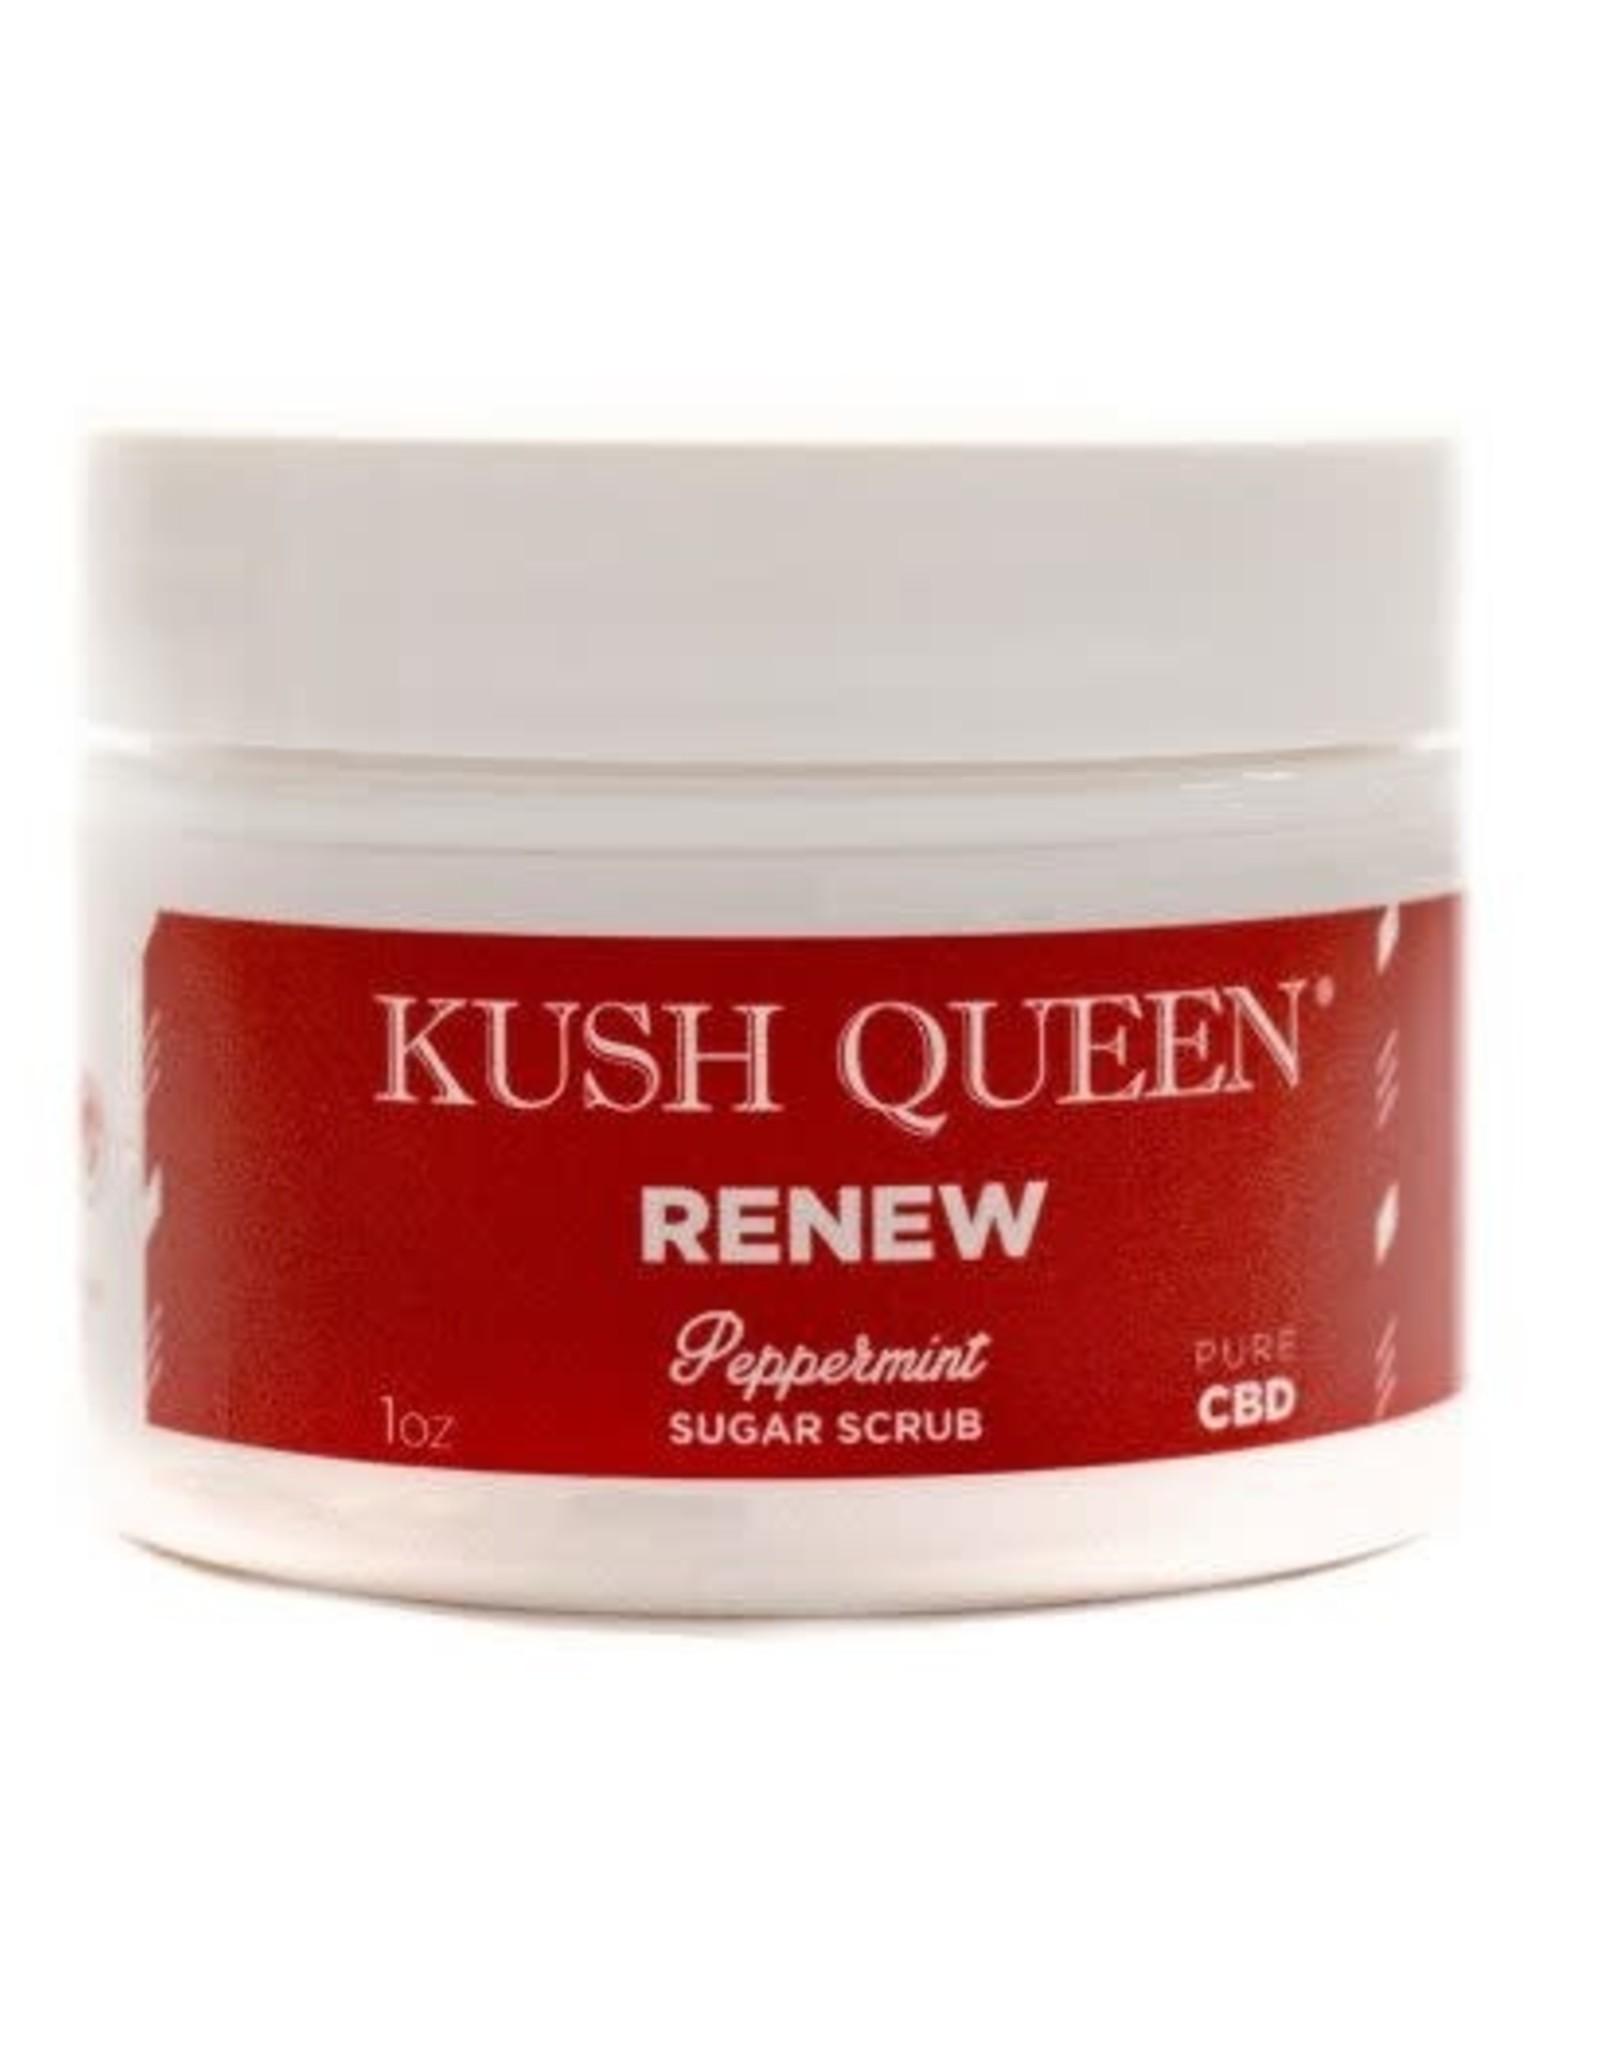 Kush Queen Renew Peppermint Sugar Scrub 1oz